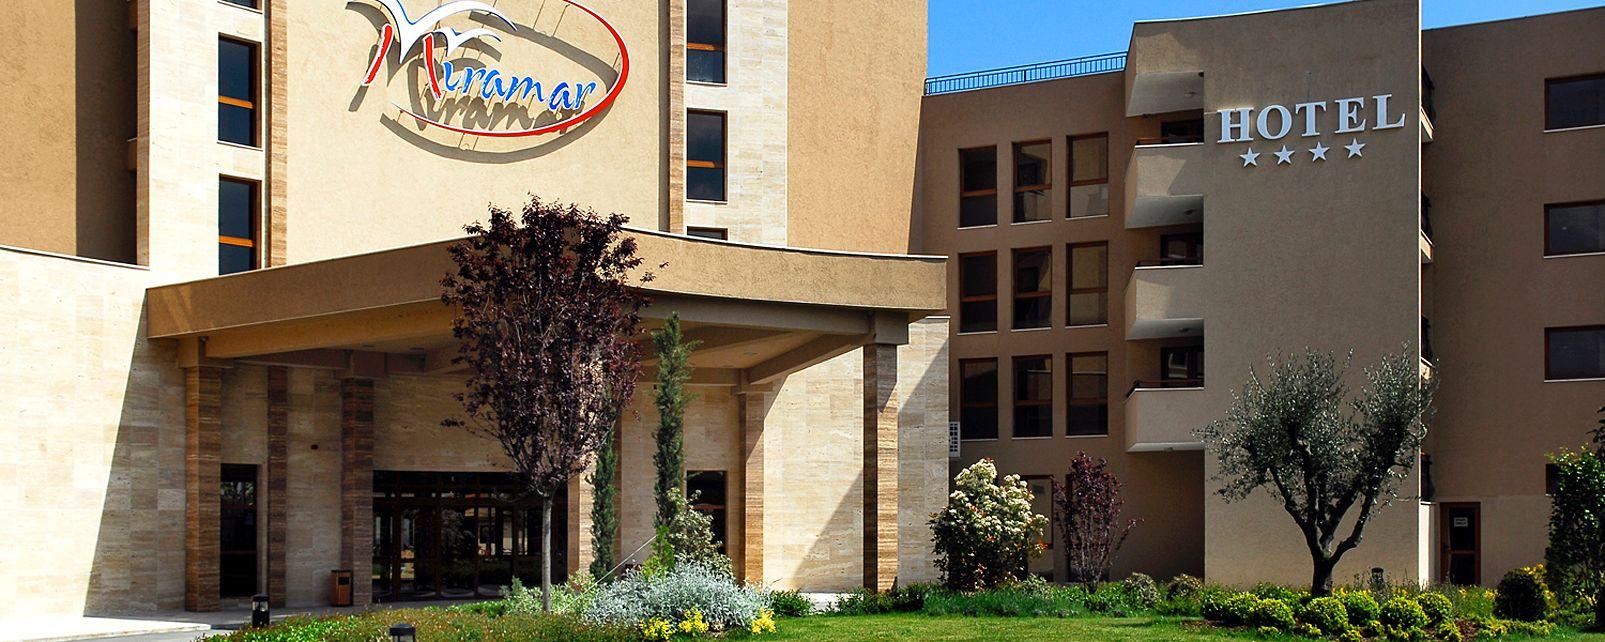 Hotel Miramar Bewertung Obzor